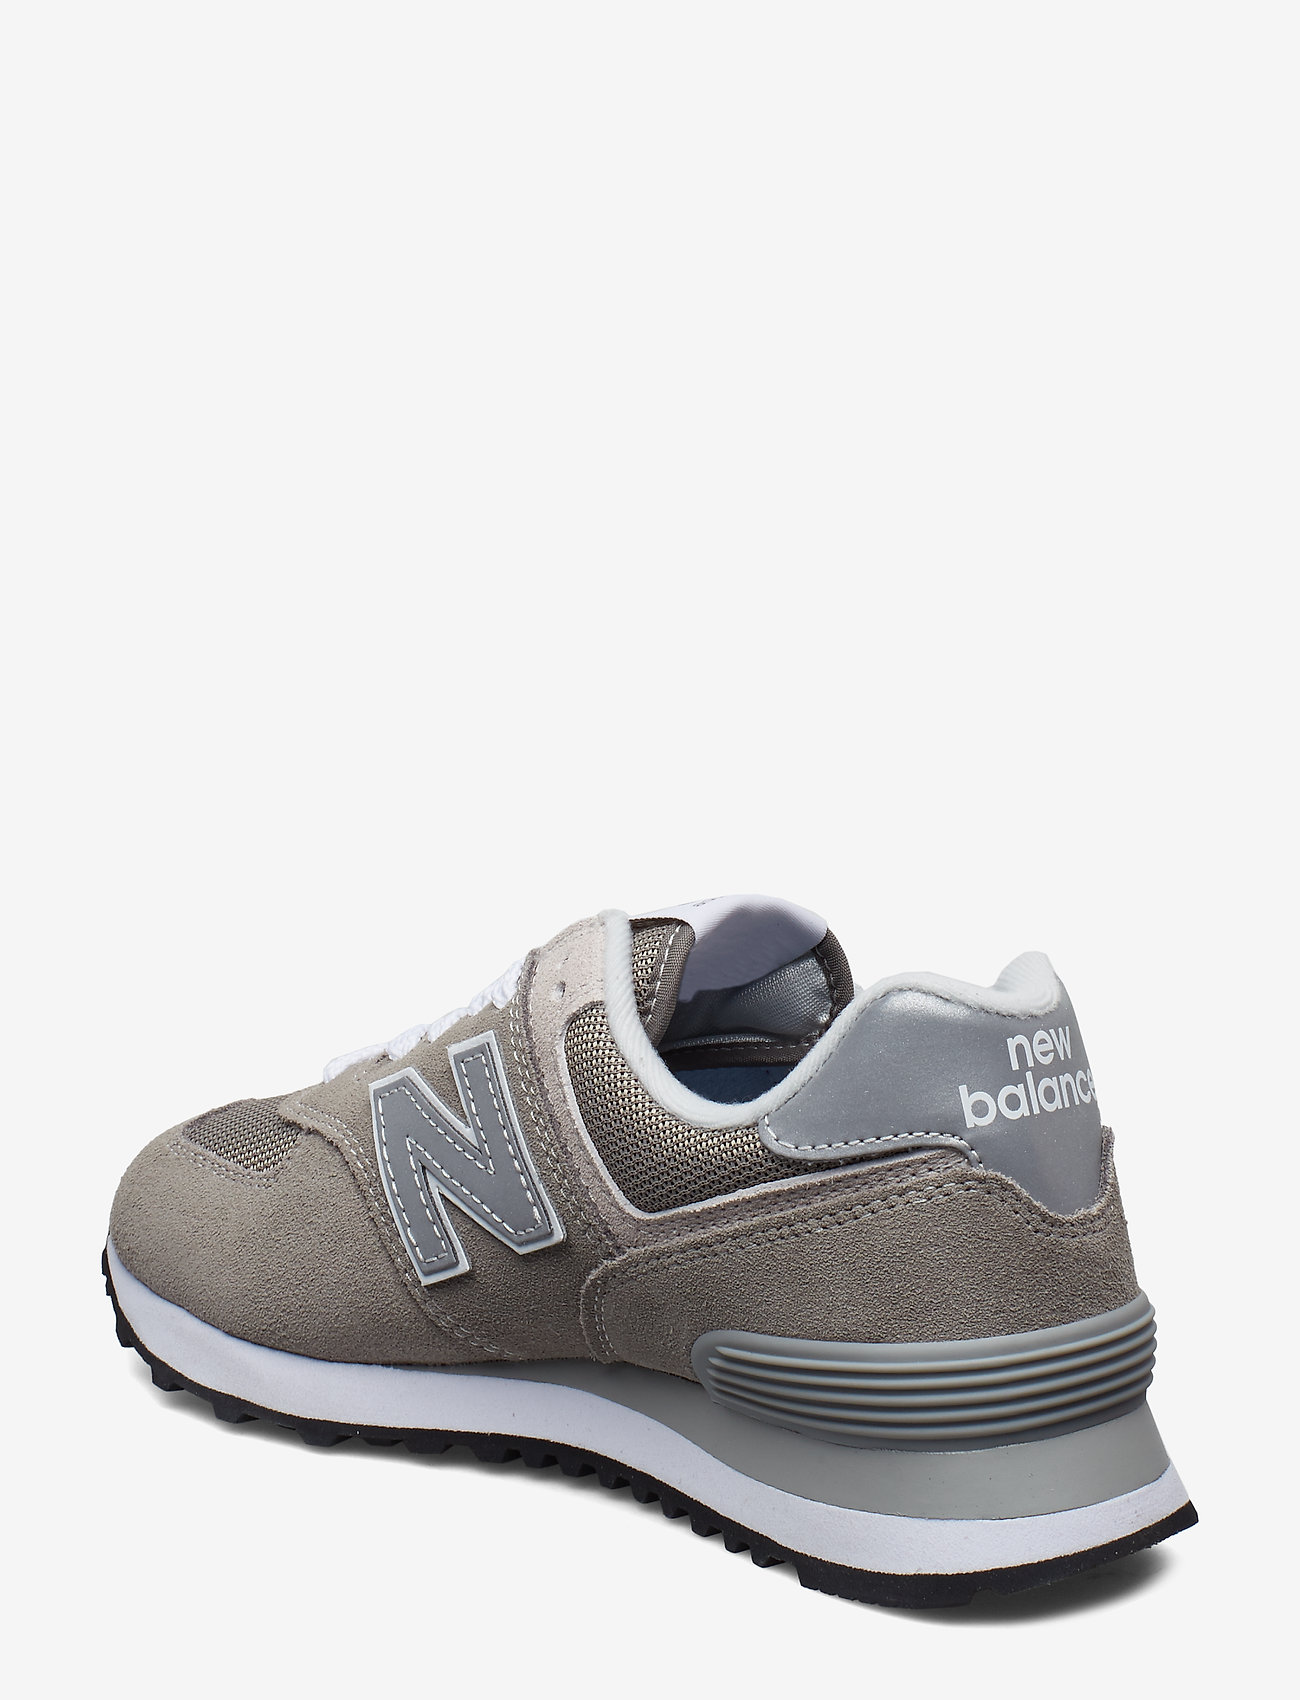 New Balance - WL574EG - low top sneakers - grey - 2